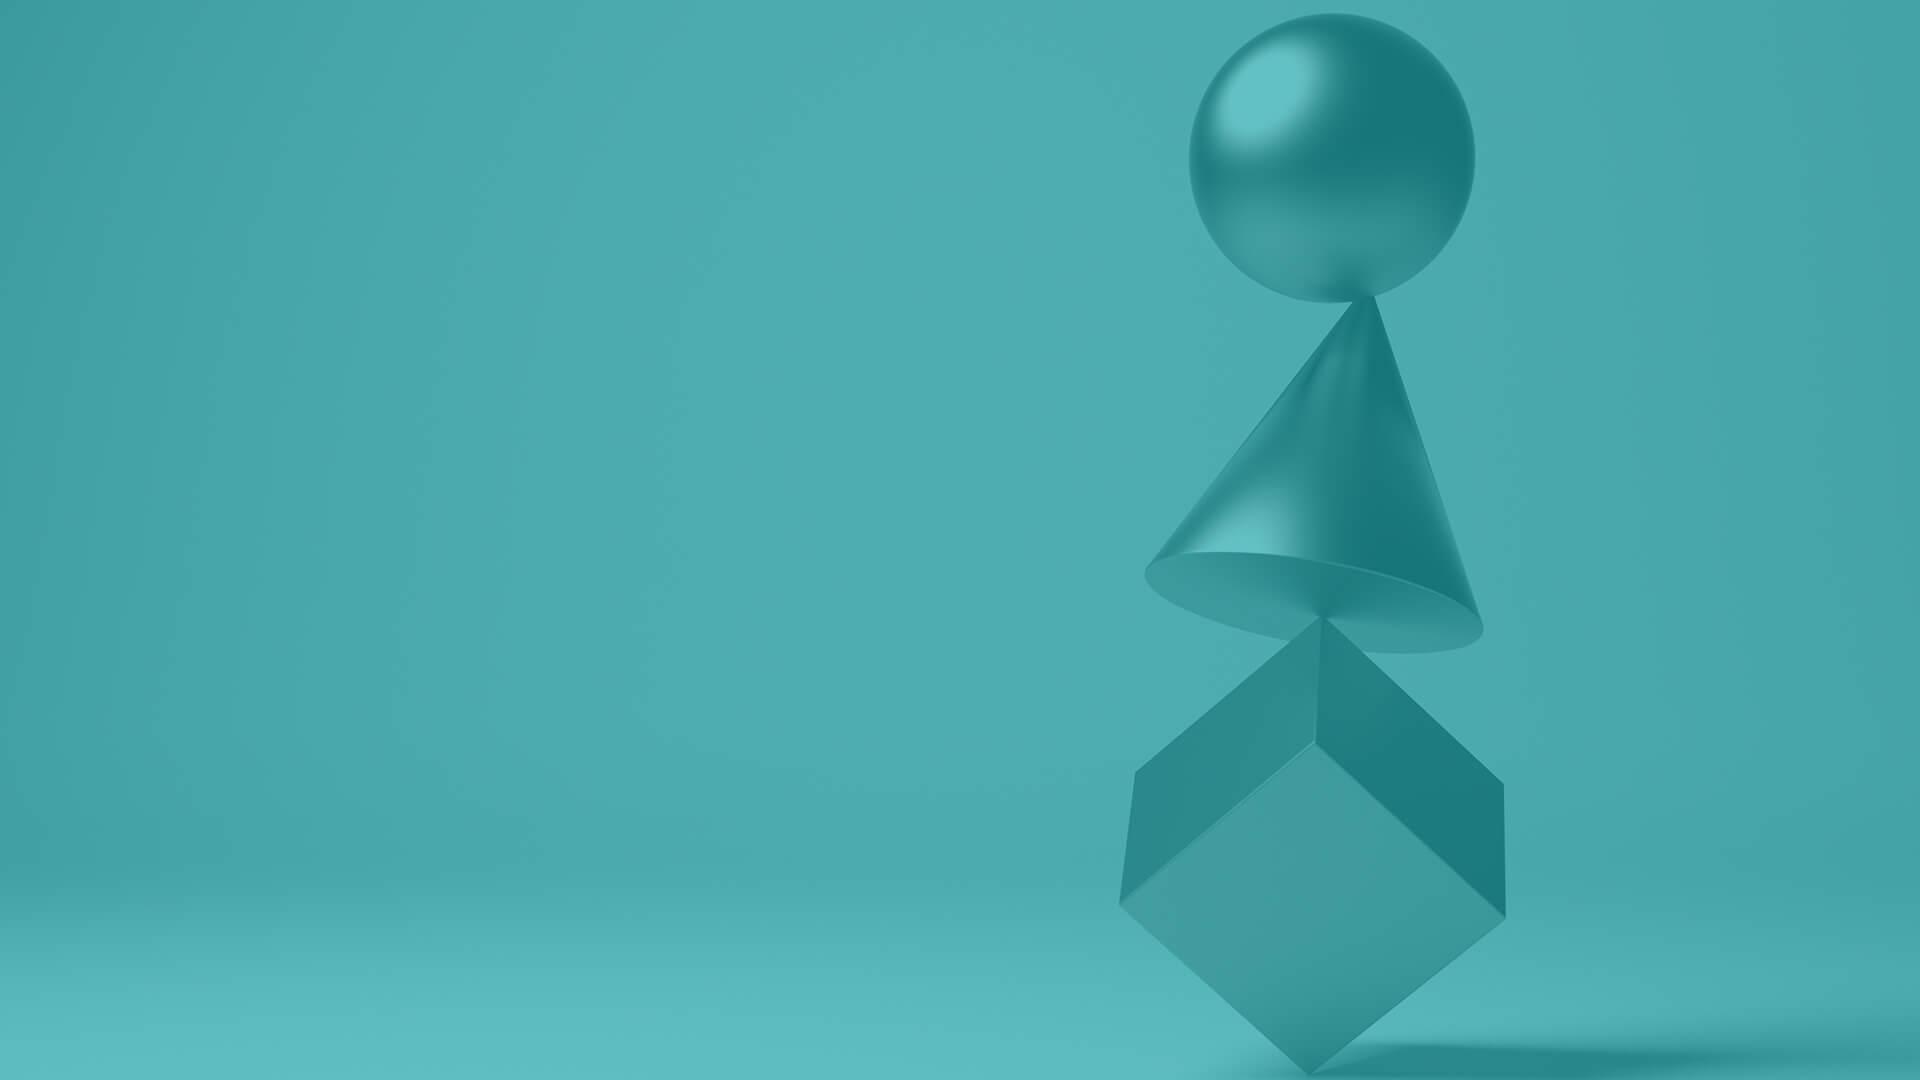 balancing the three elements of grc